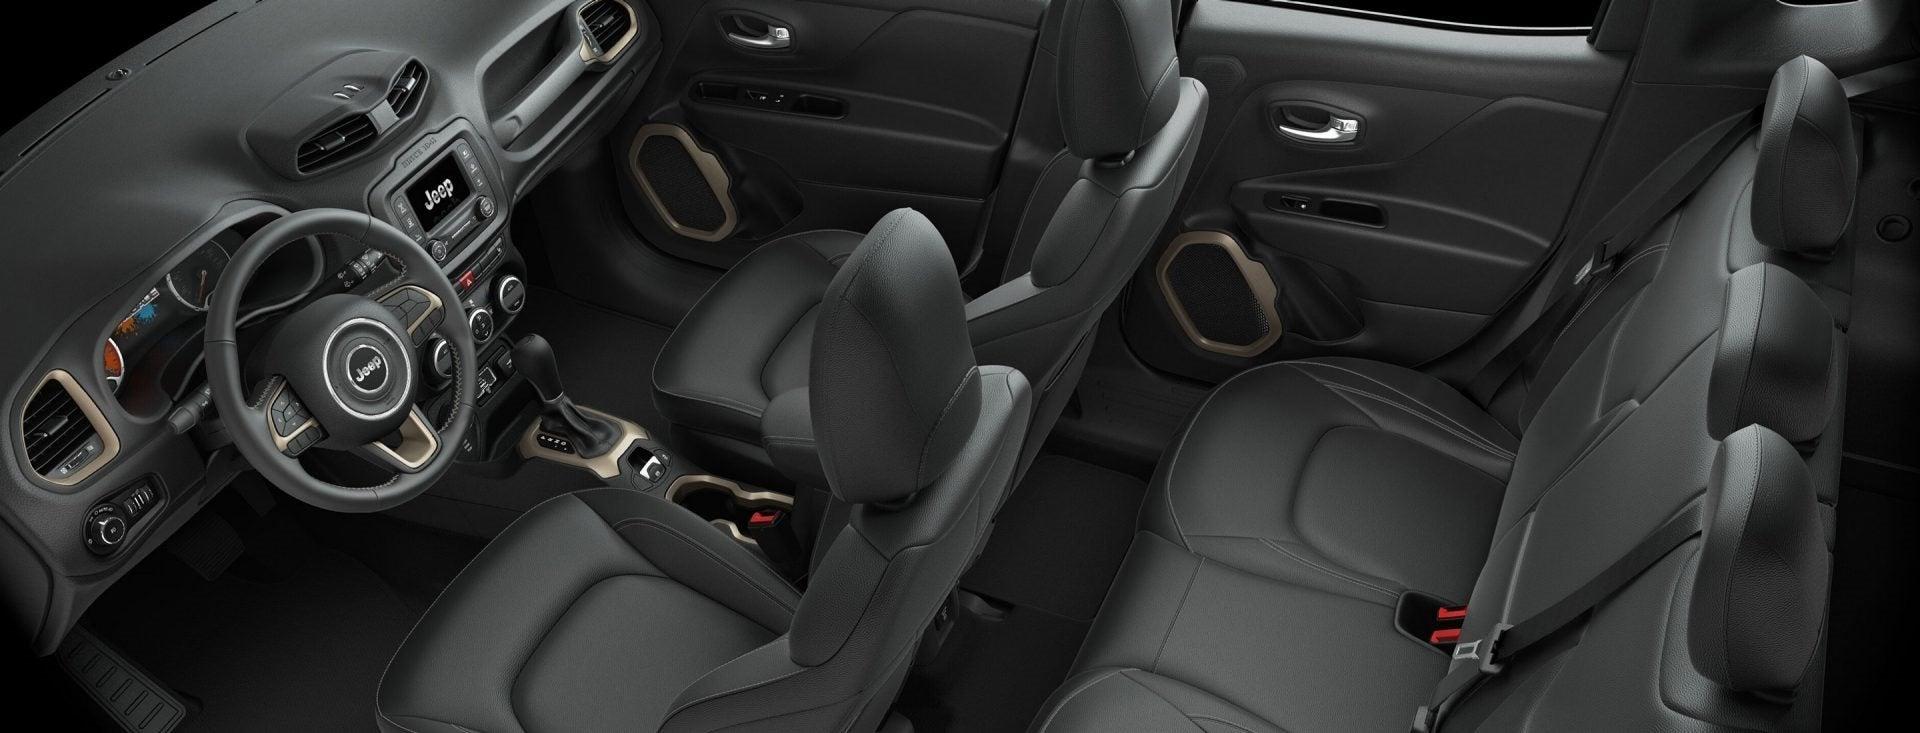 Jeep Renegade Interior >> New Jeep Renegade For Sale Des Moines Ia Granger Motors